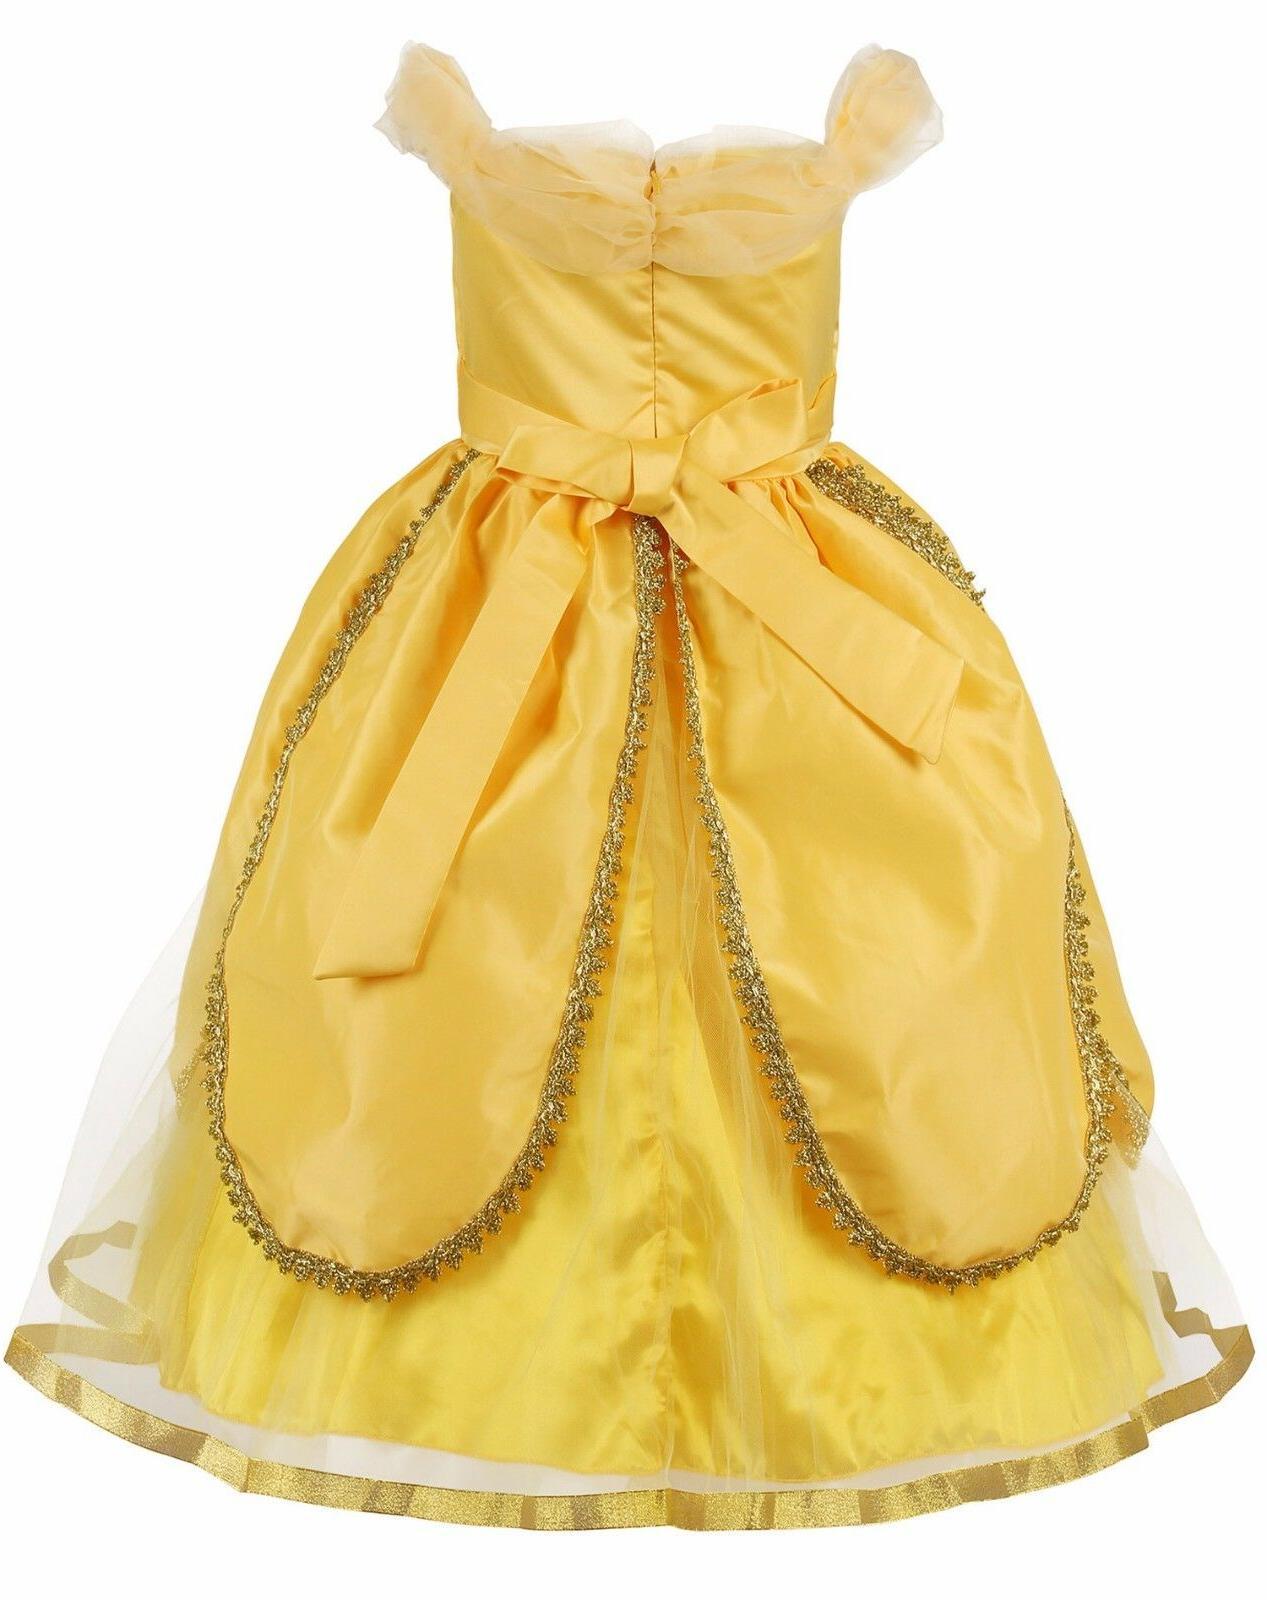 Girls Cosplay Princess Dress Yellow Ball Party Dress